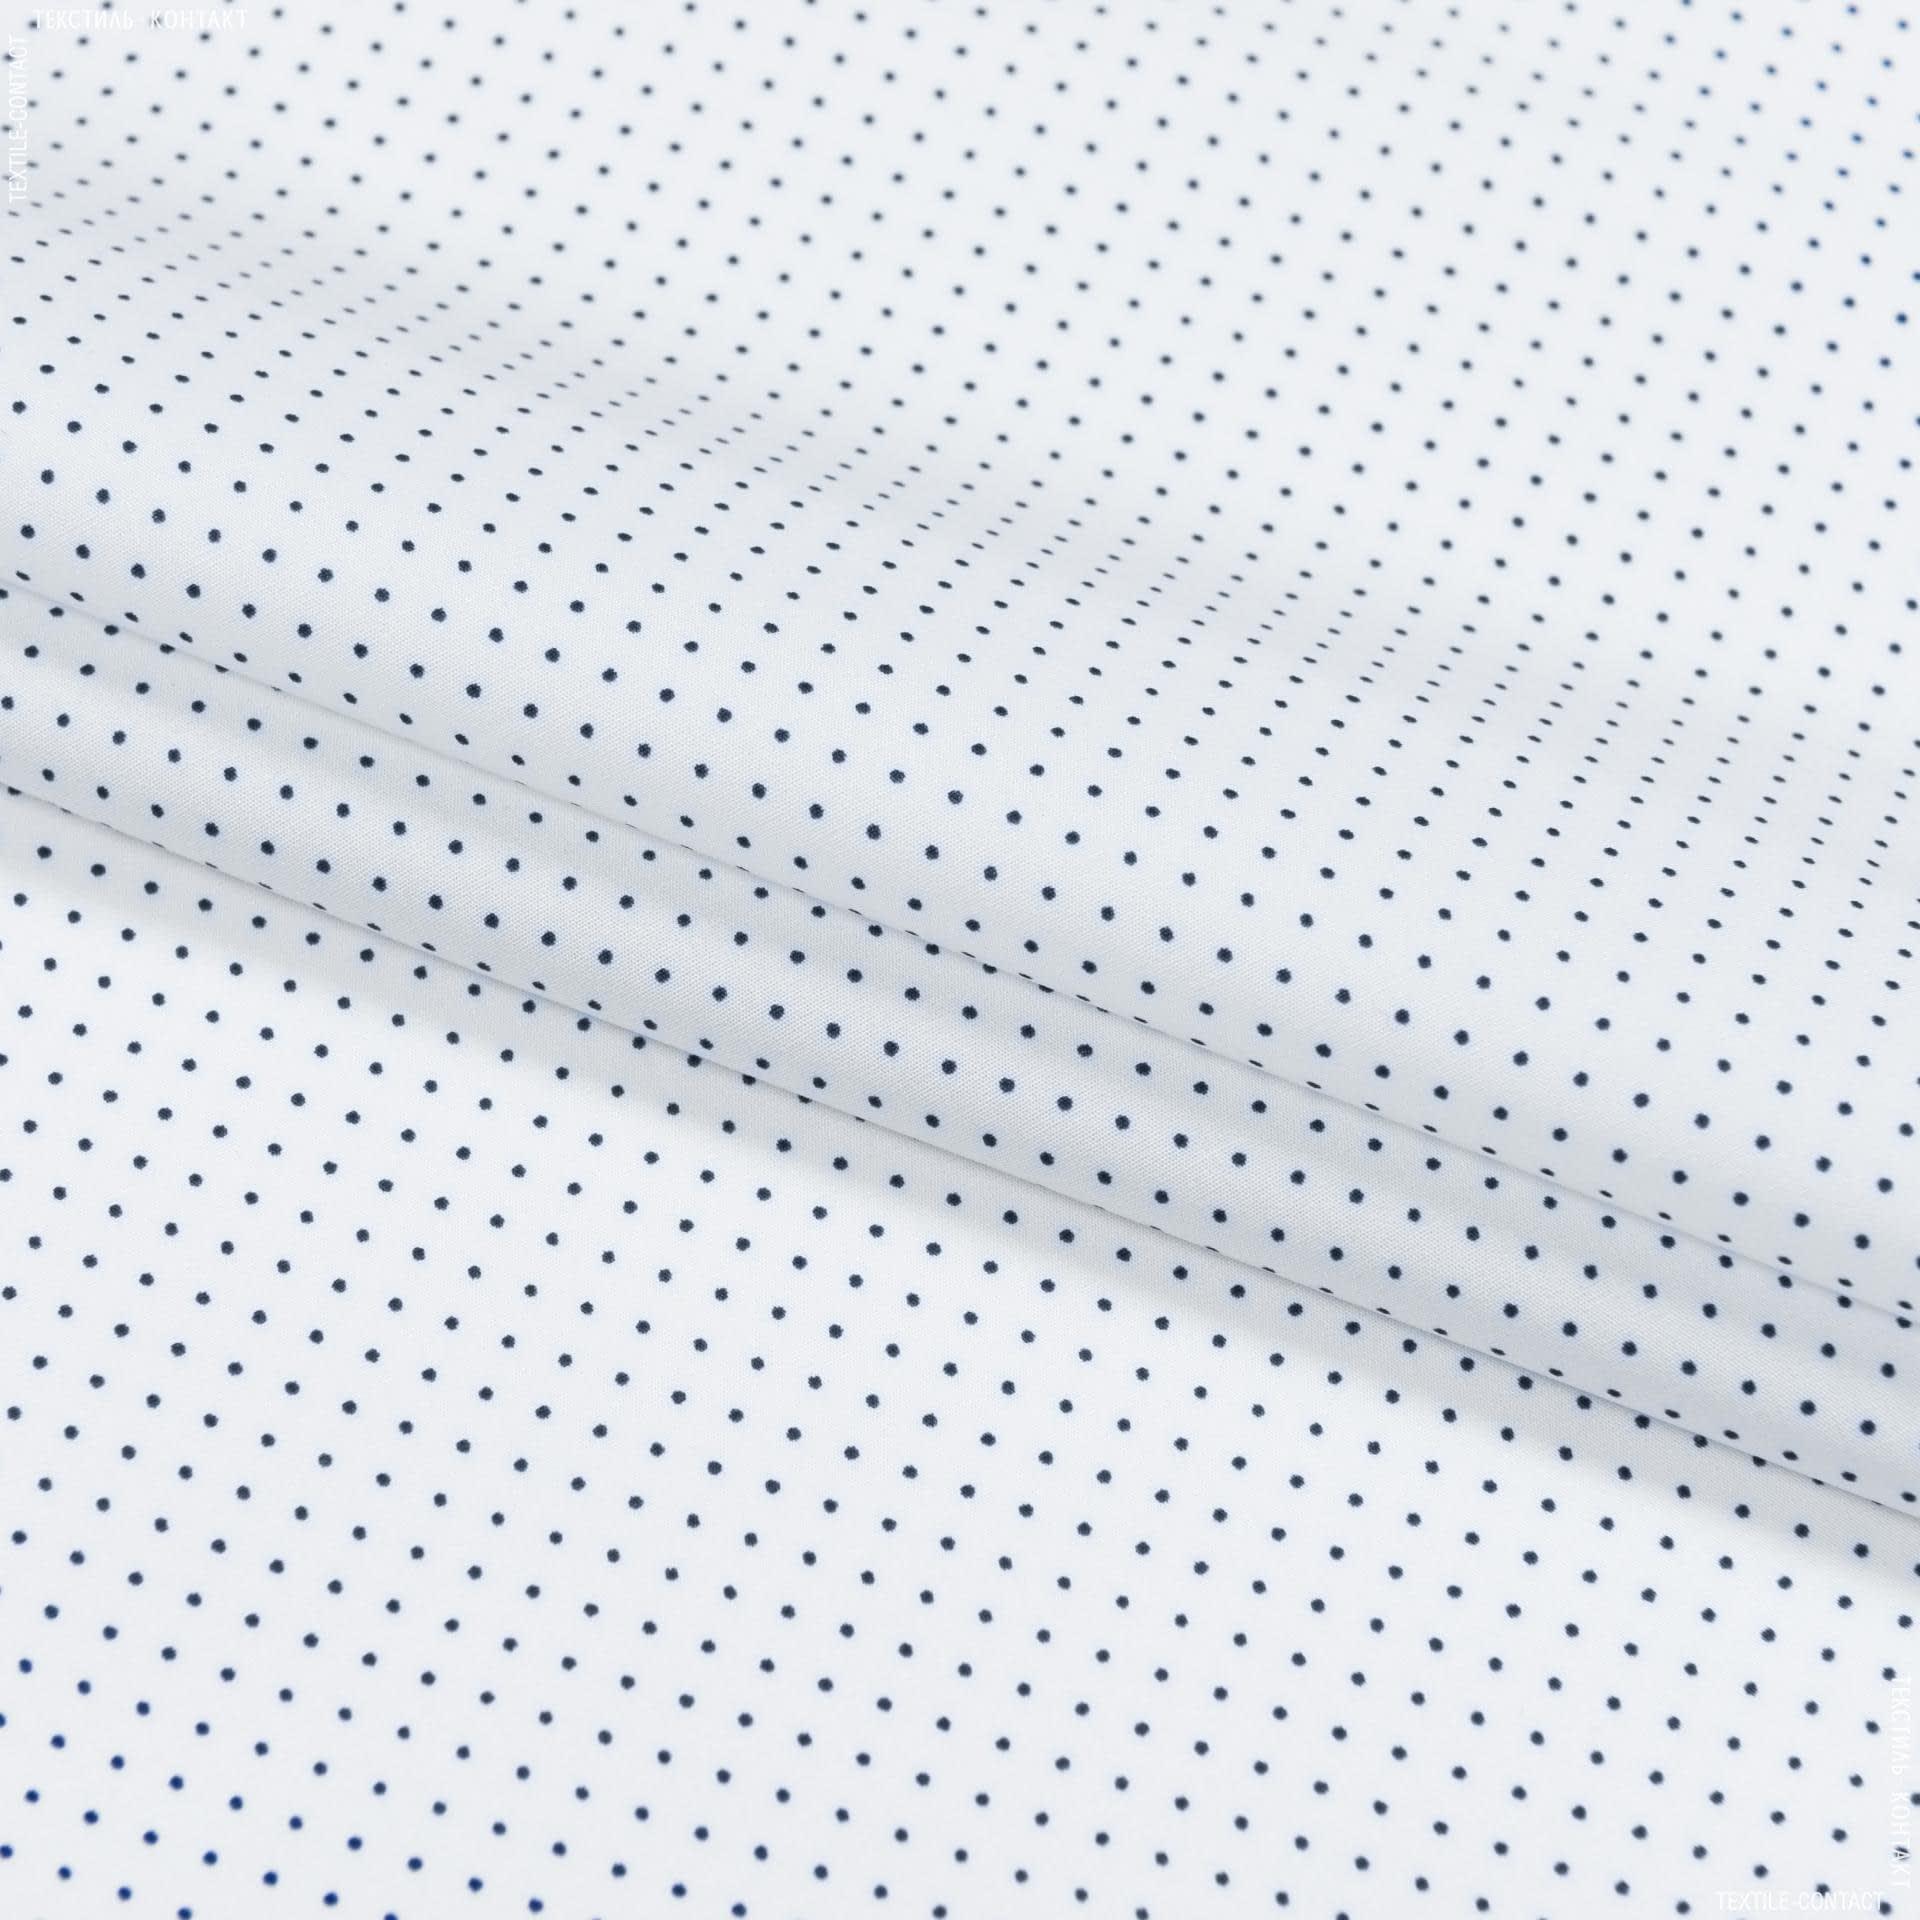 Тканини для хусток та бандан - Сорочкова  match point